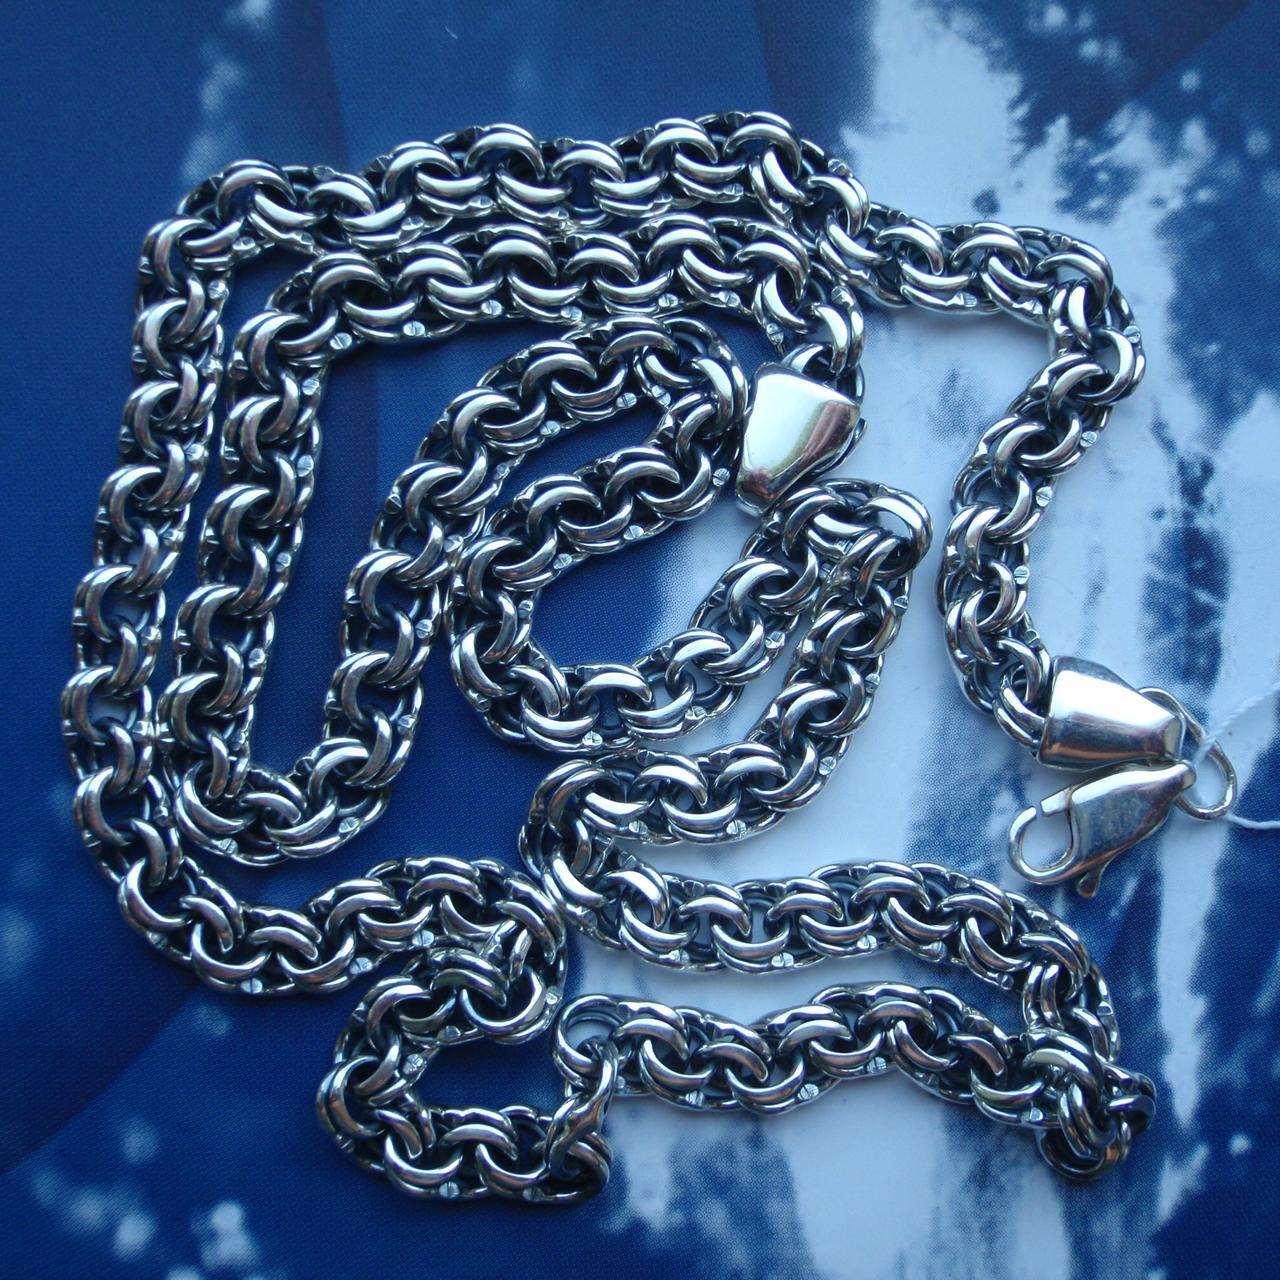 Серебряная цепочка, 600мм, 28 грамм, плетение Бисмарк